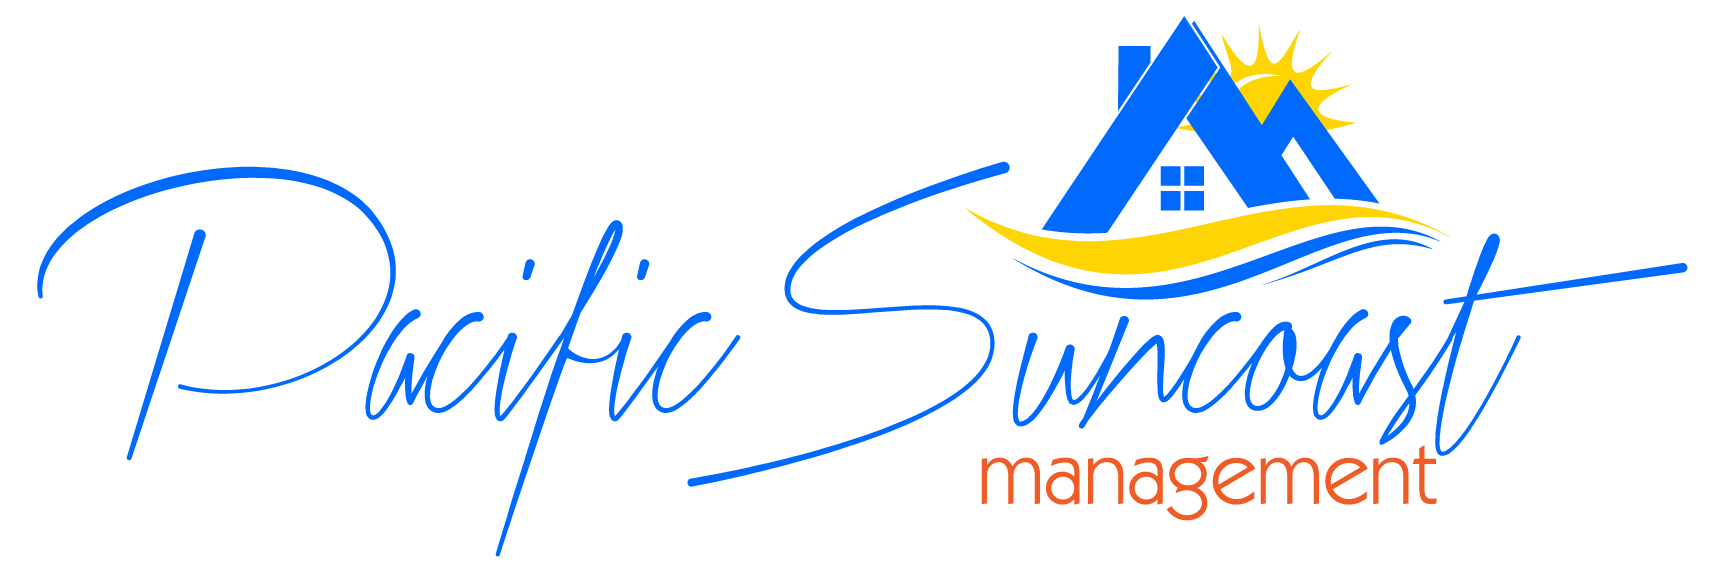 Pacific Suncoast Management